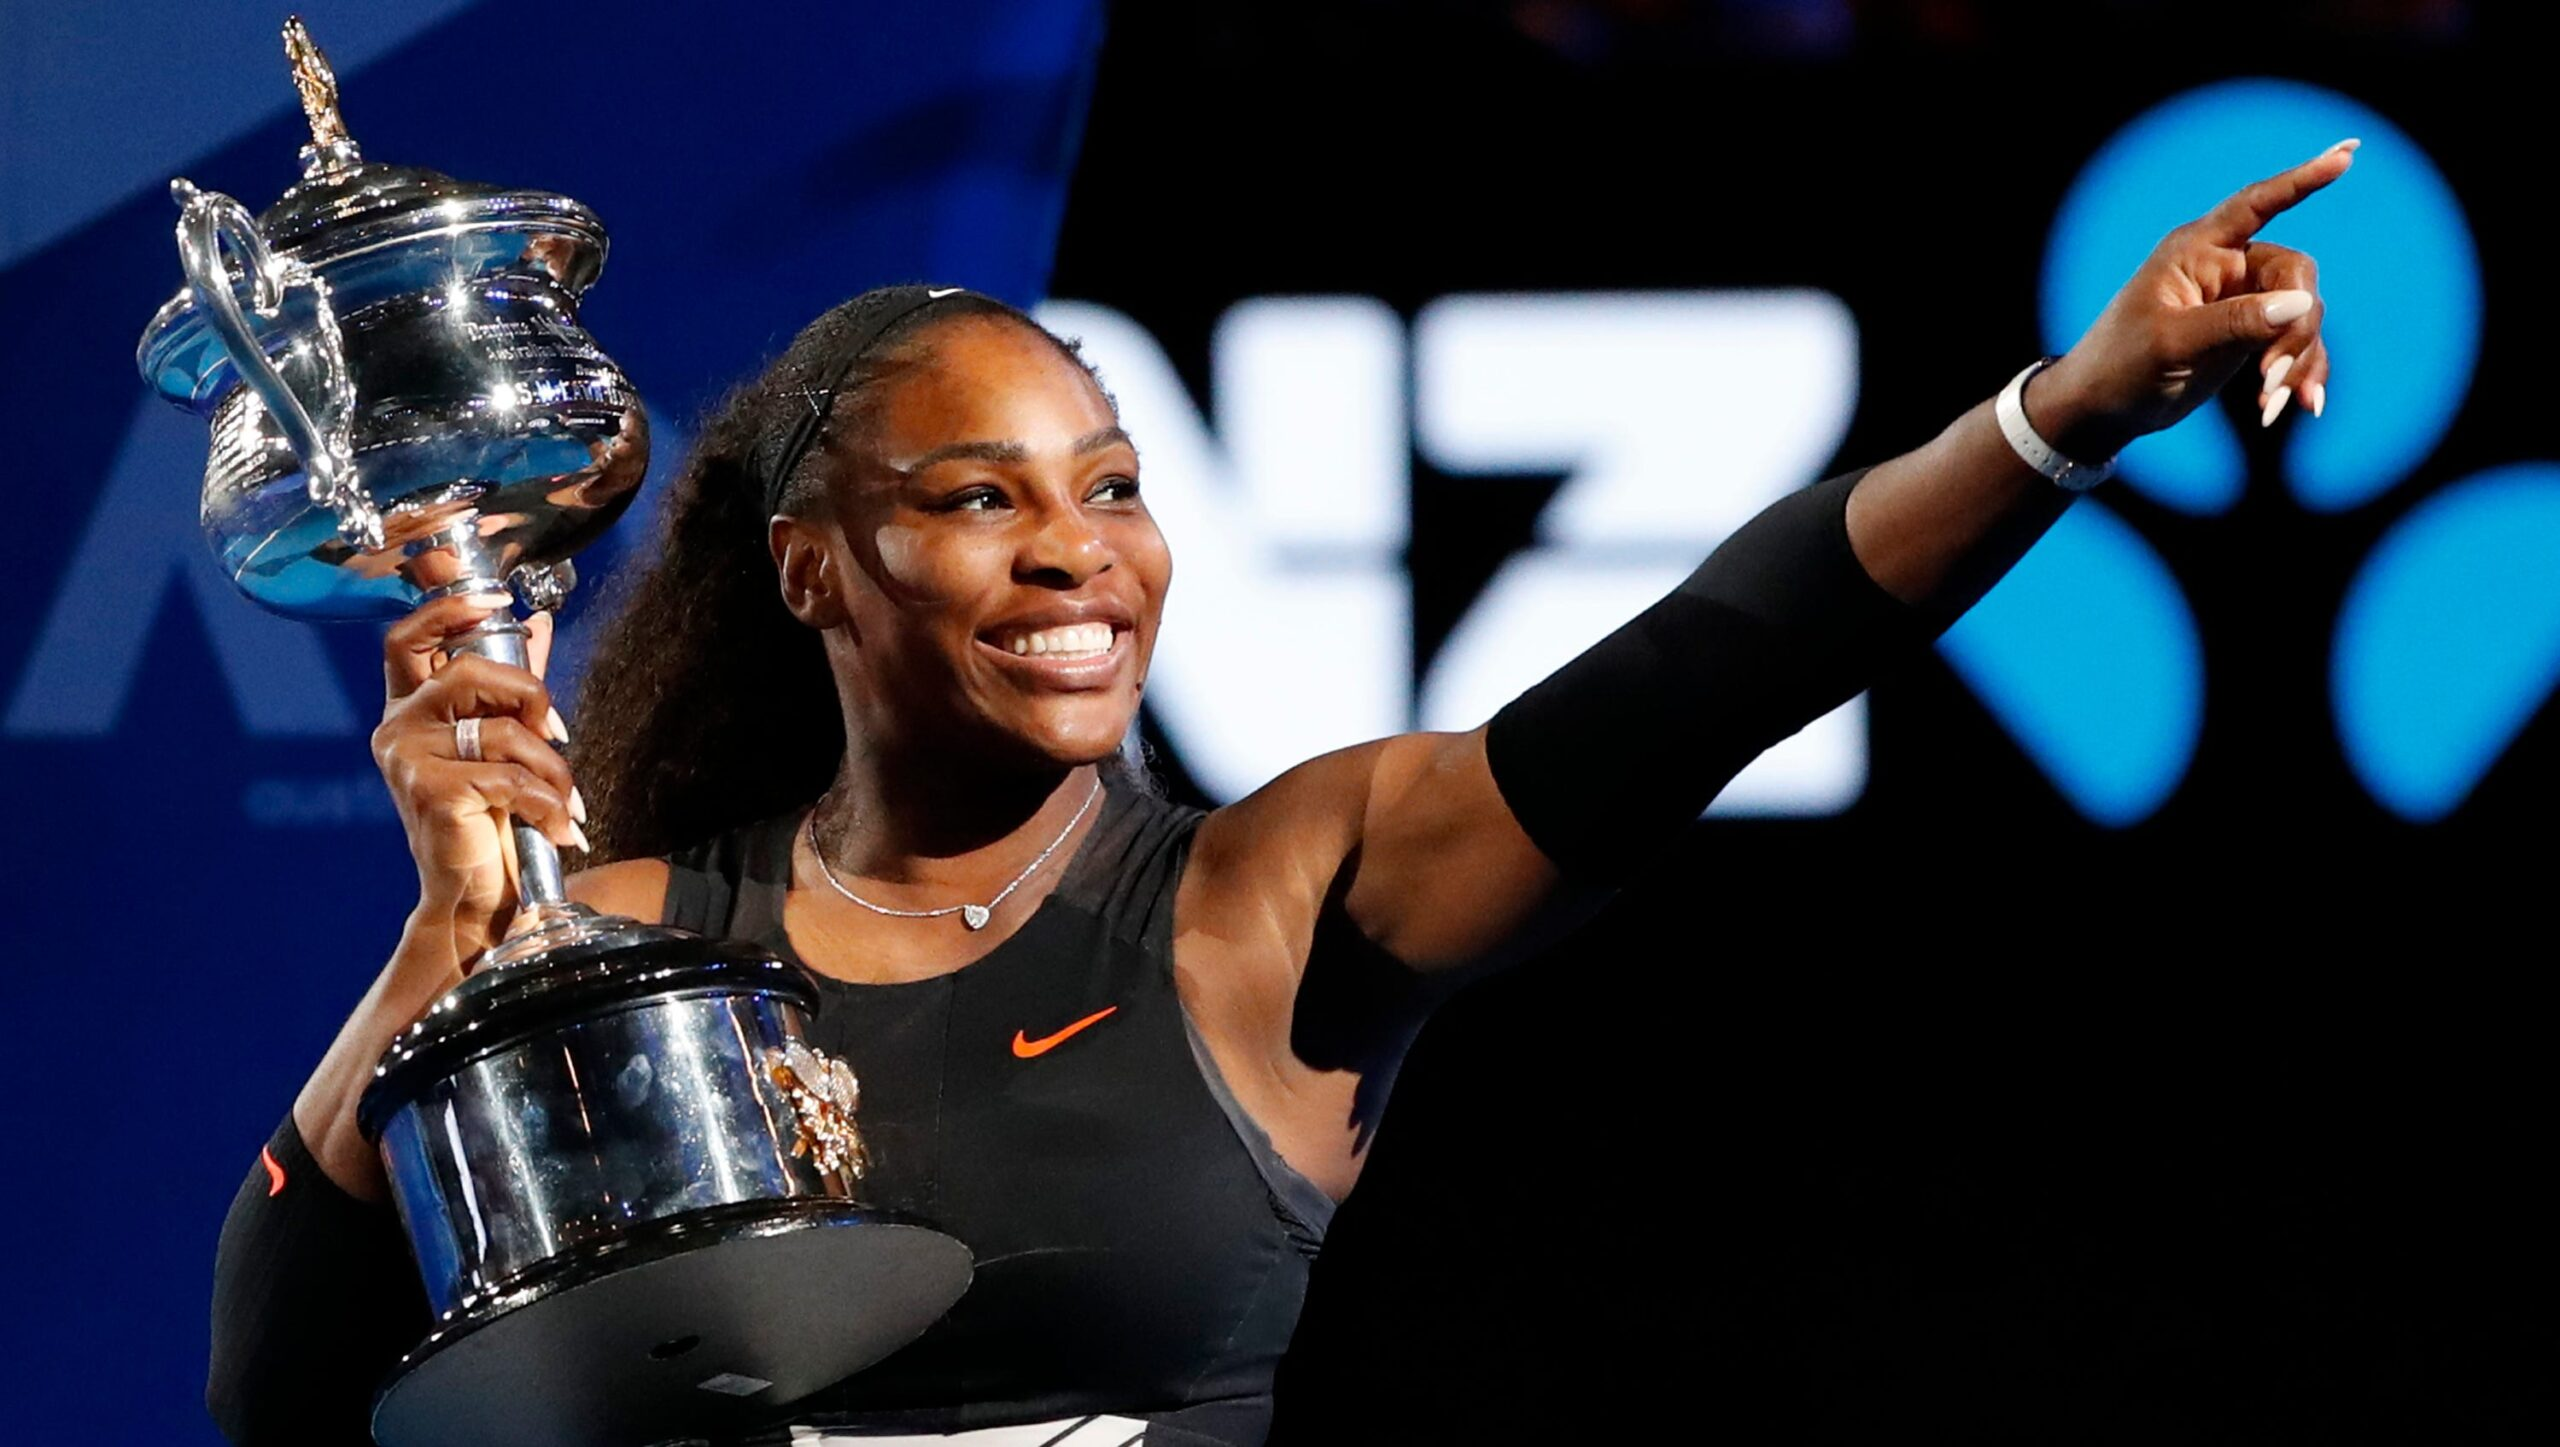 Serena Williams breaks record with 23rd Grand Slam